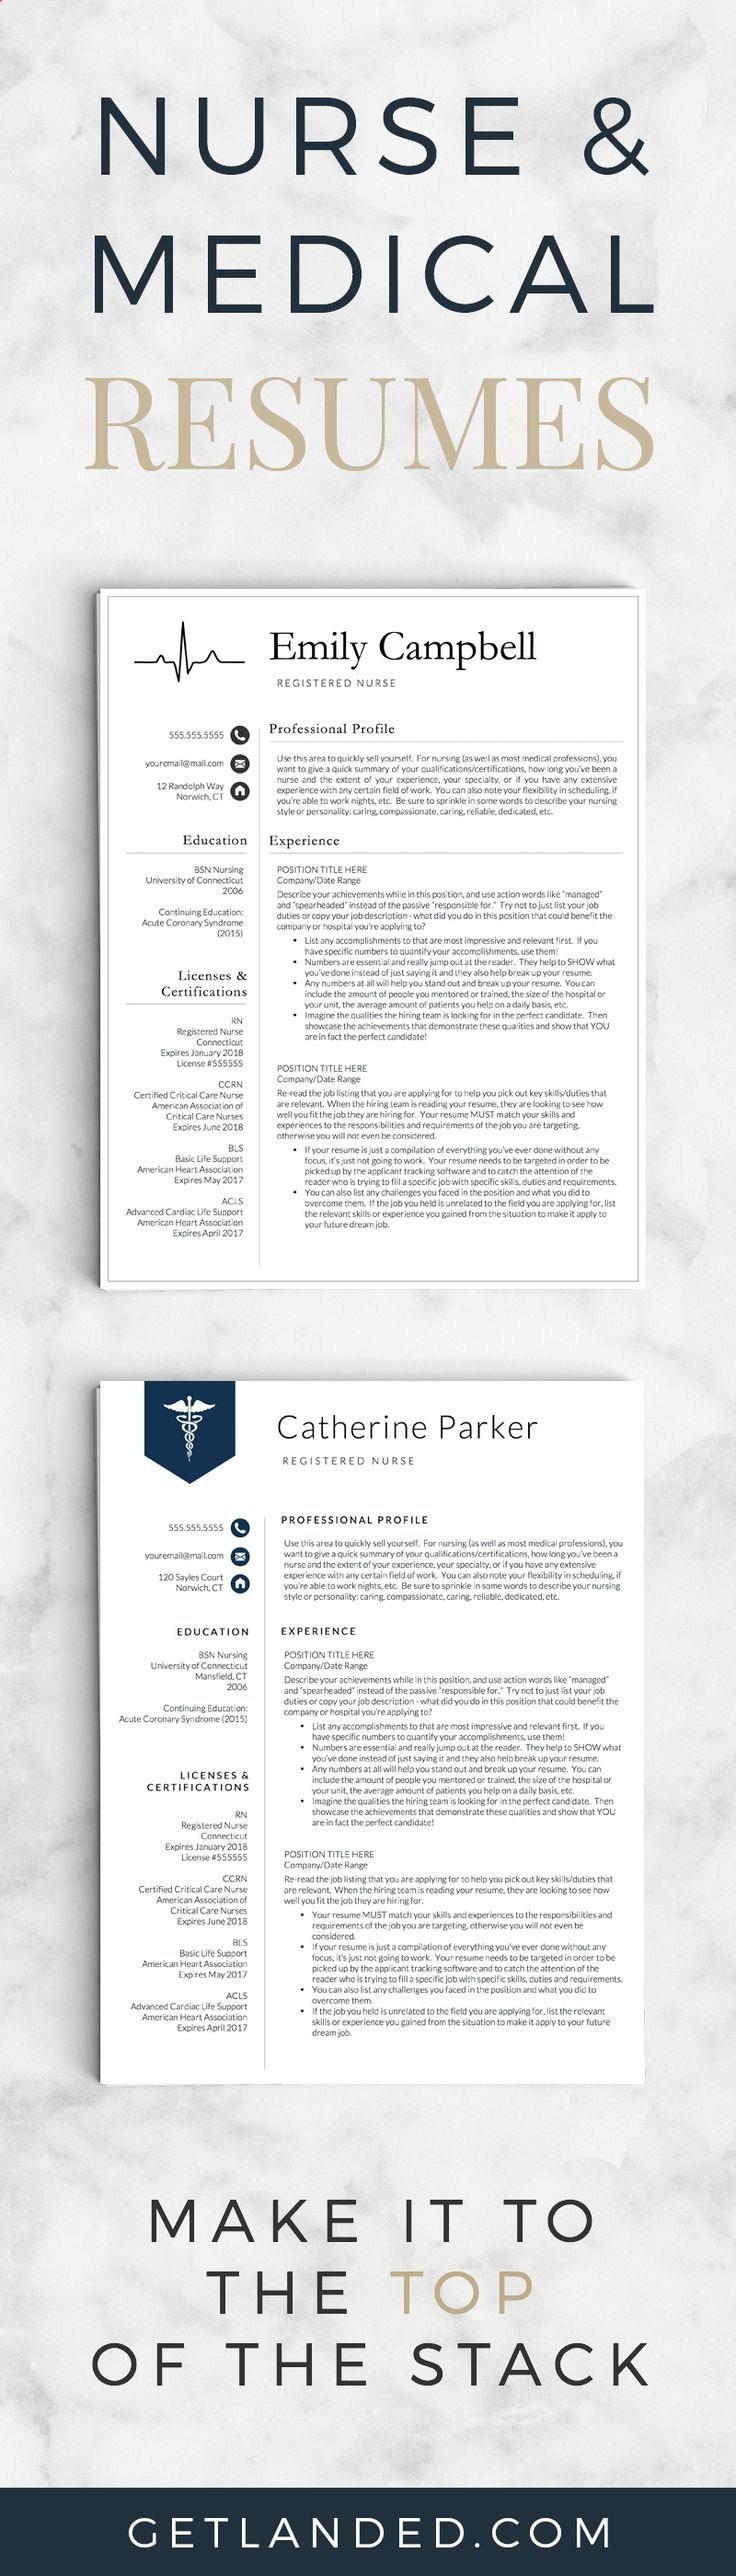 Nurse resume templates medical resumes resume